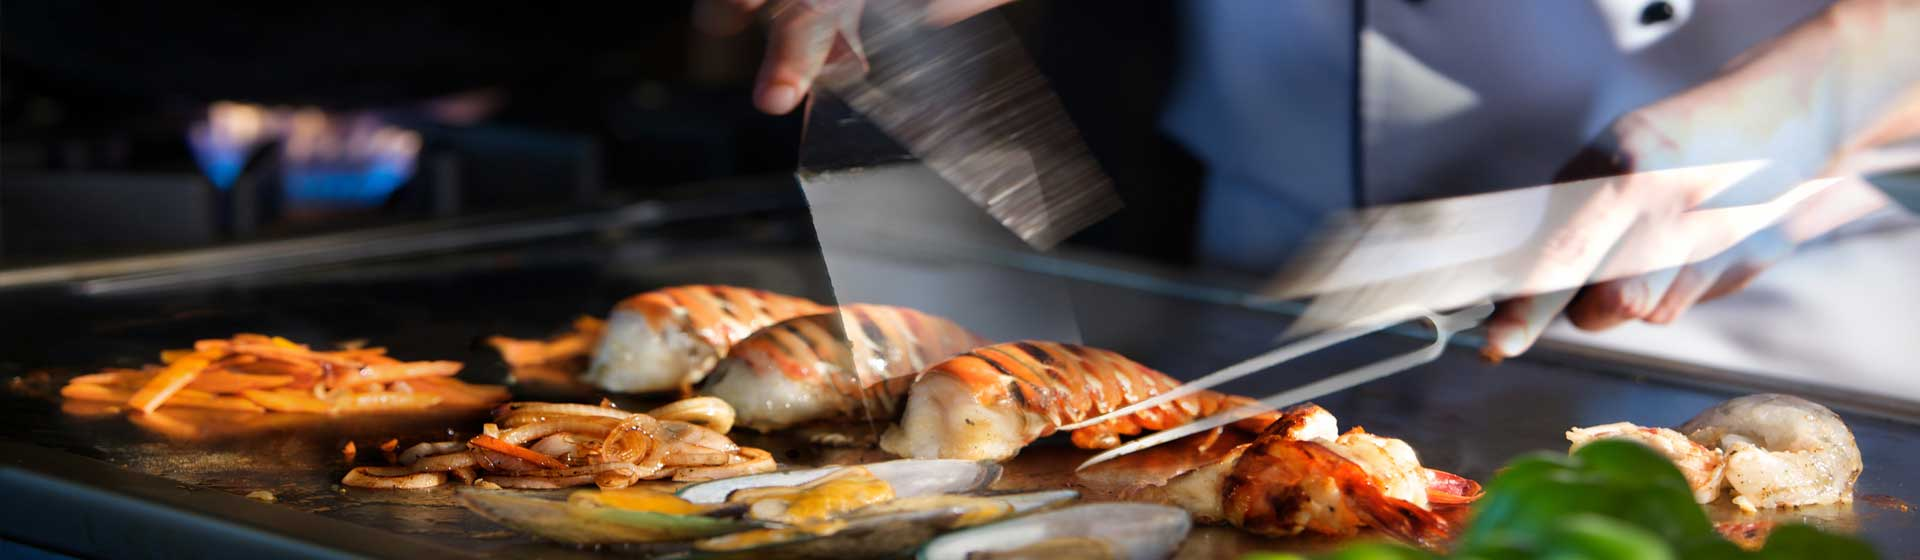 slide_menu_01b_pizzeria_restaurante_erik_lanzarote